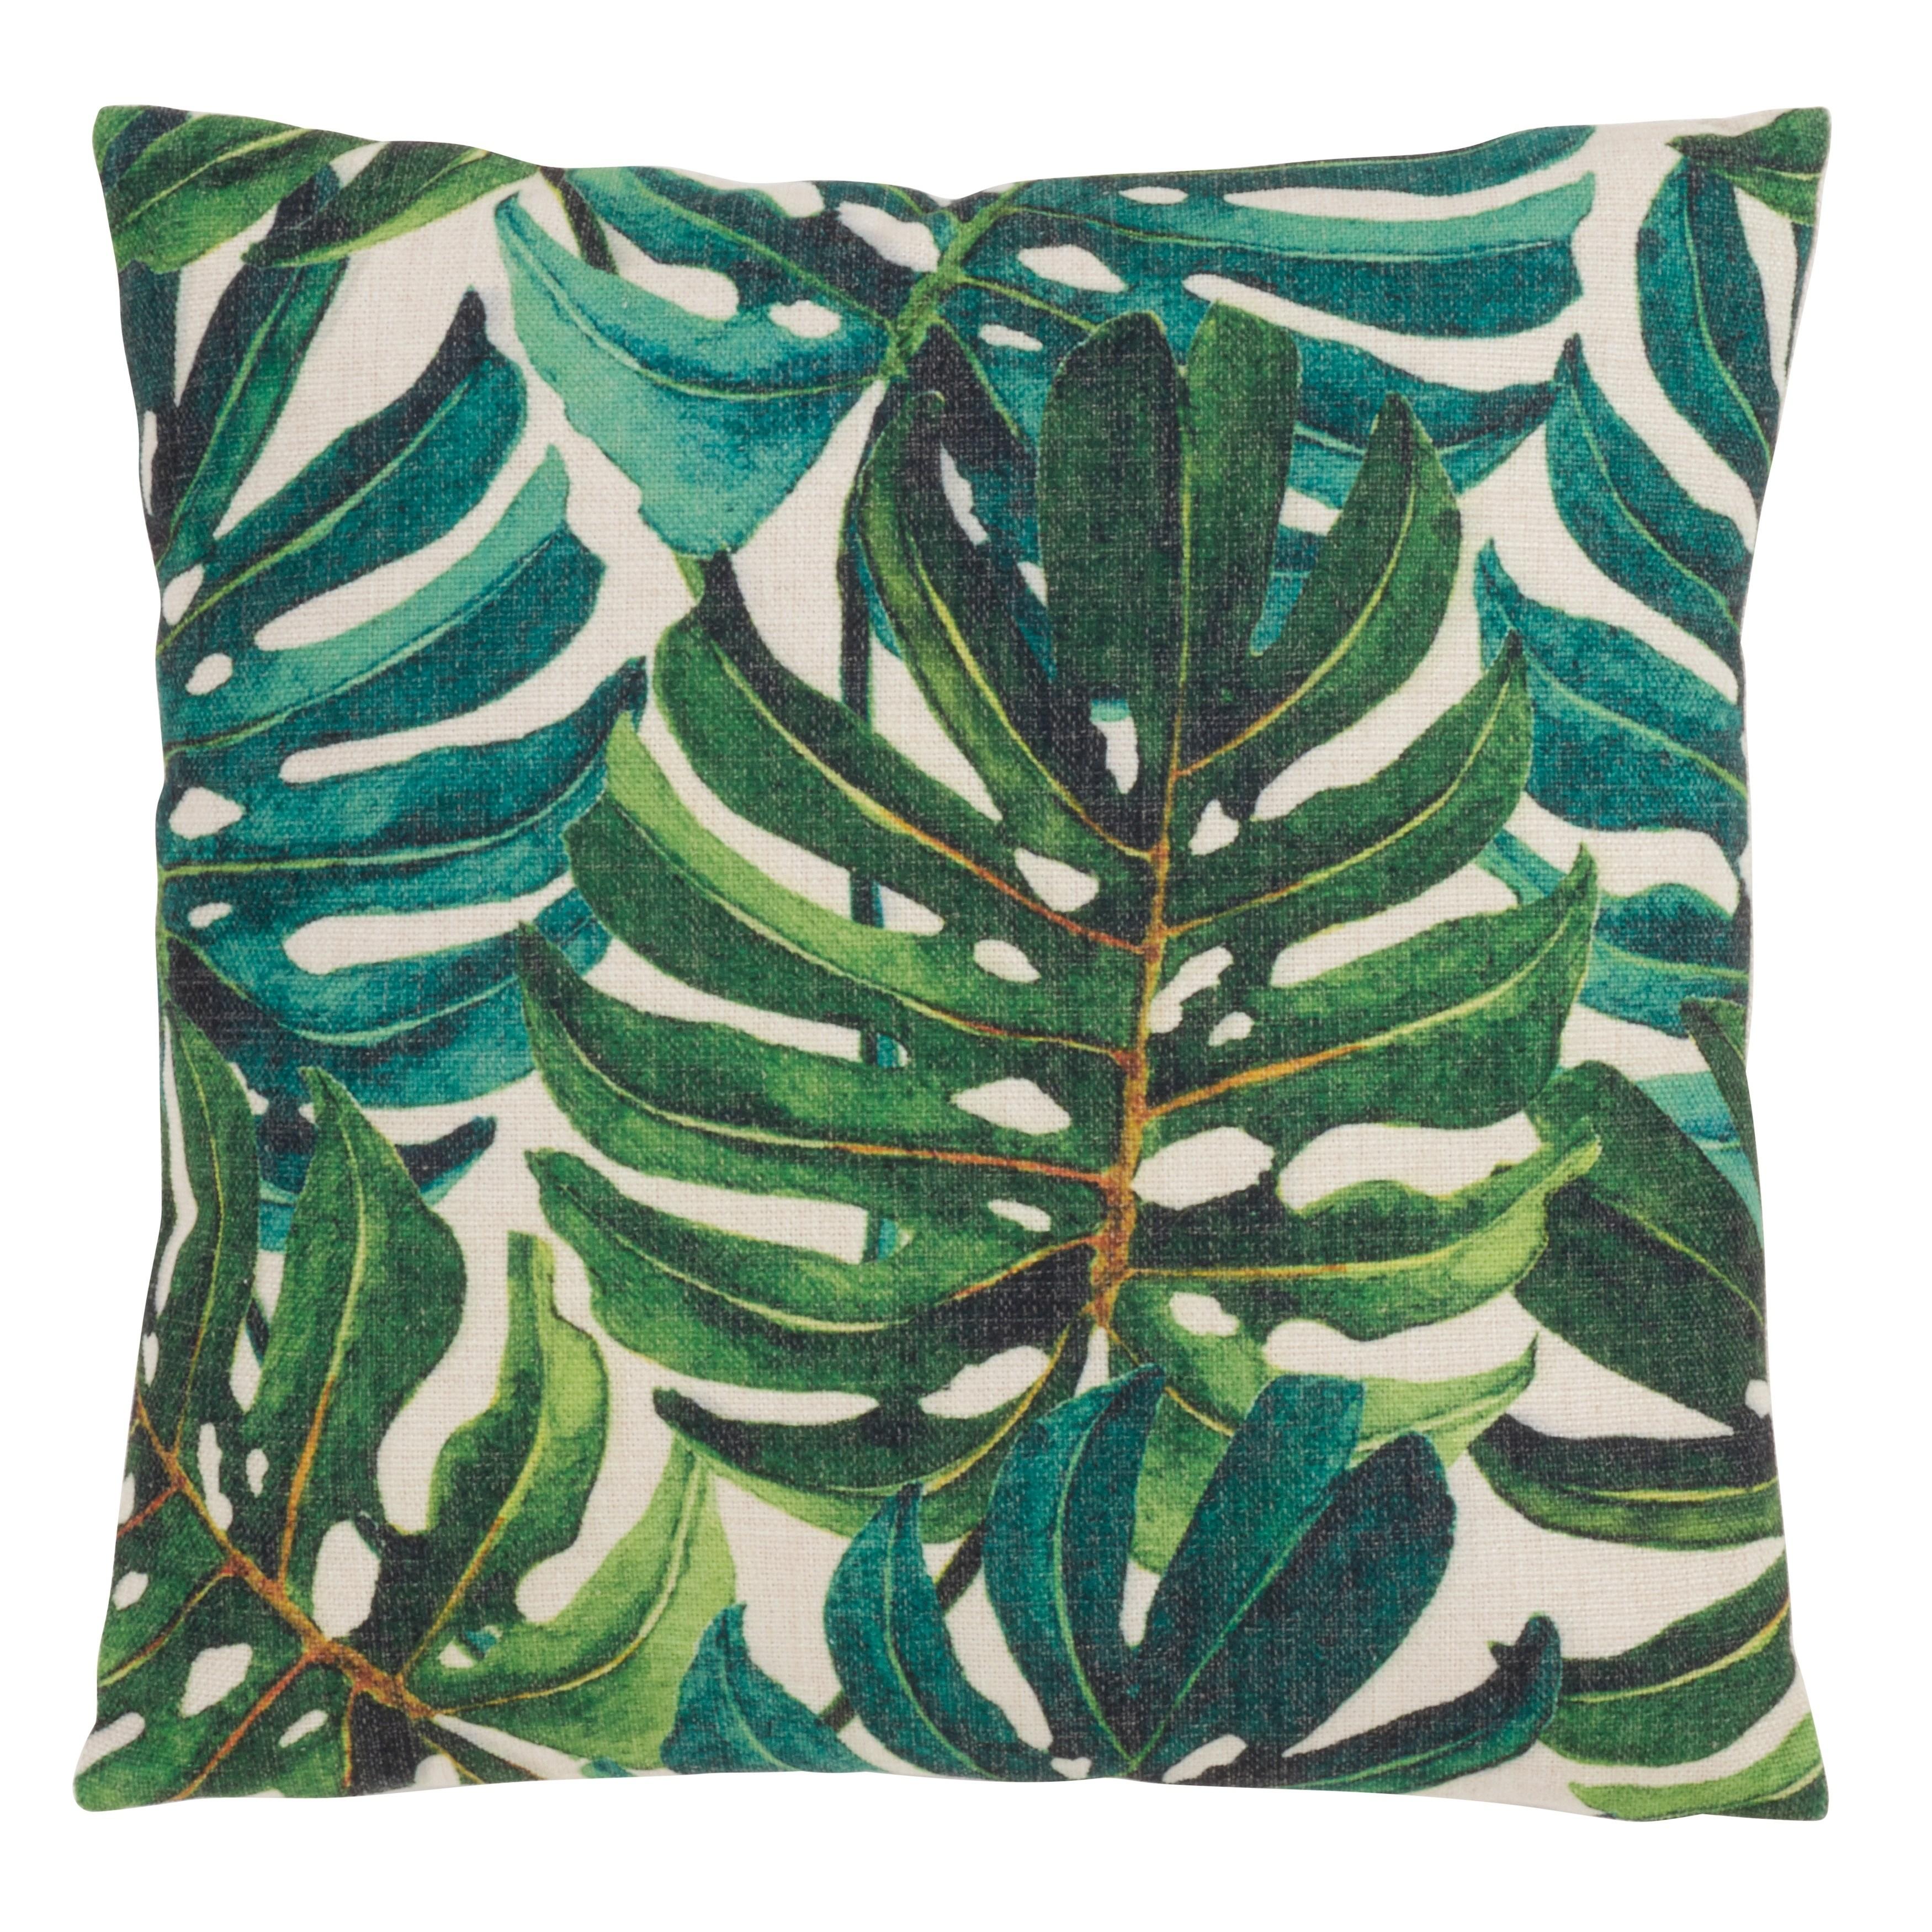 Banana Leaf Print Tropical Throw Pillow